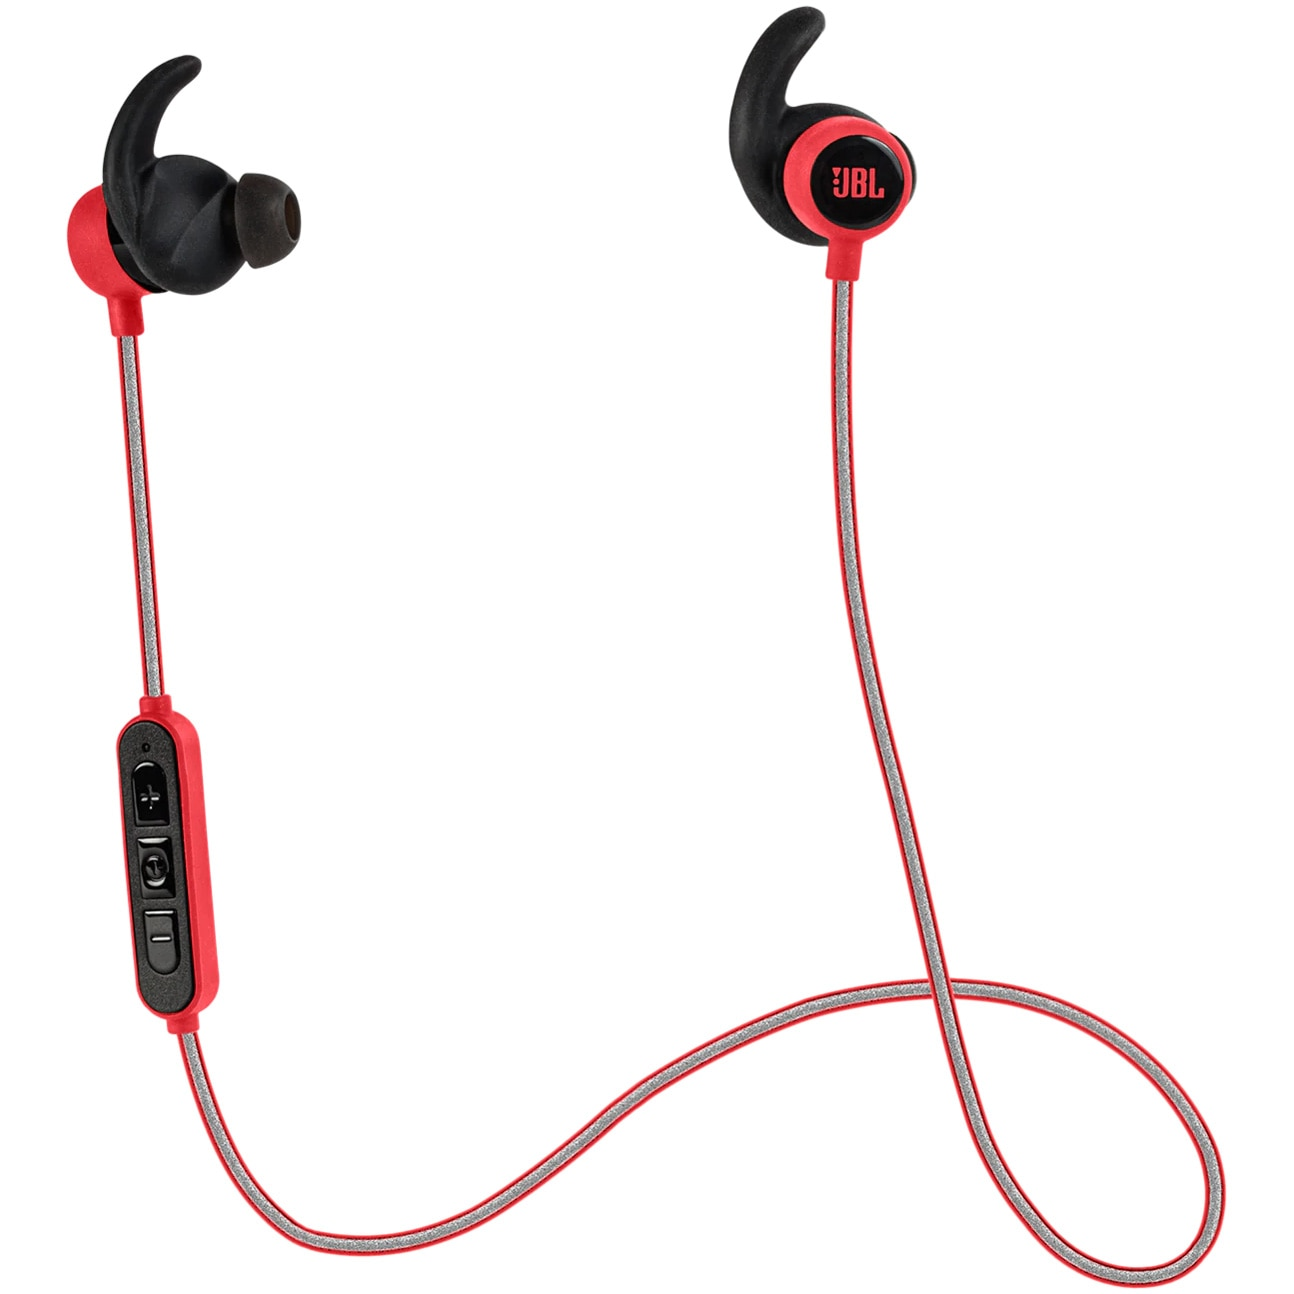 Fotografie Casti Audio In ear JBL Mini, Wireless, Bluetooth, Functie bass, Autonomie 8 ore, Rosu